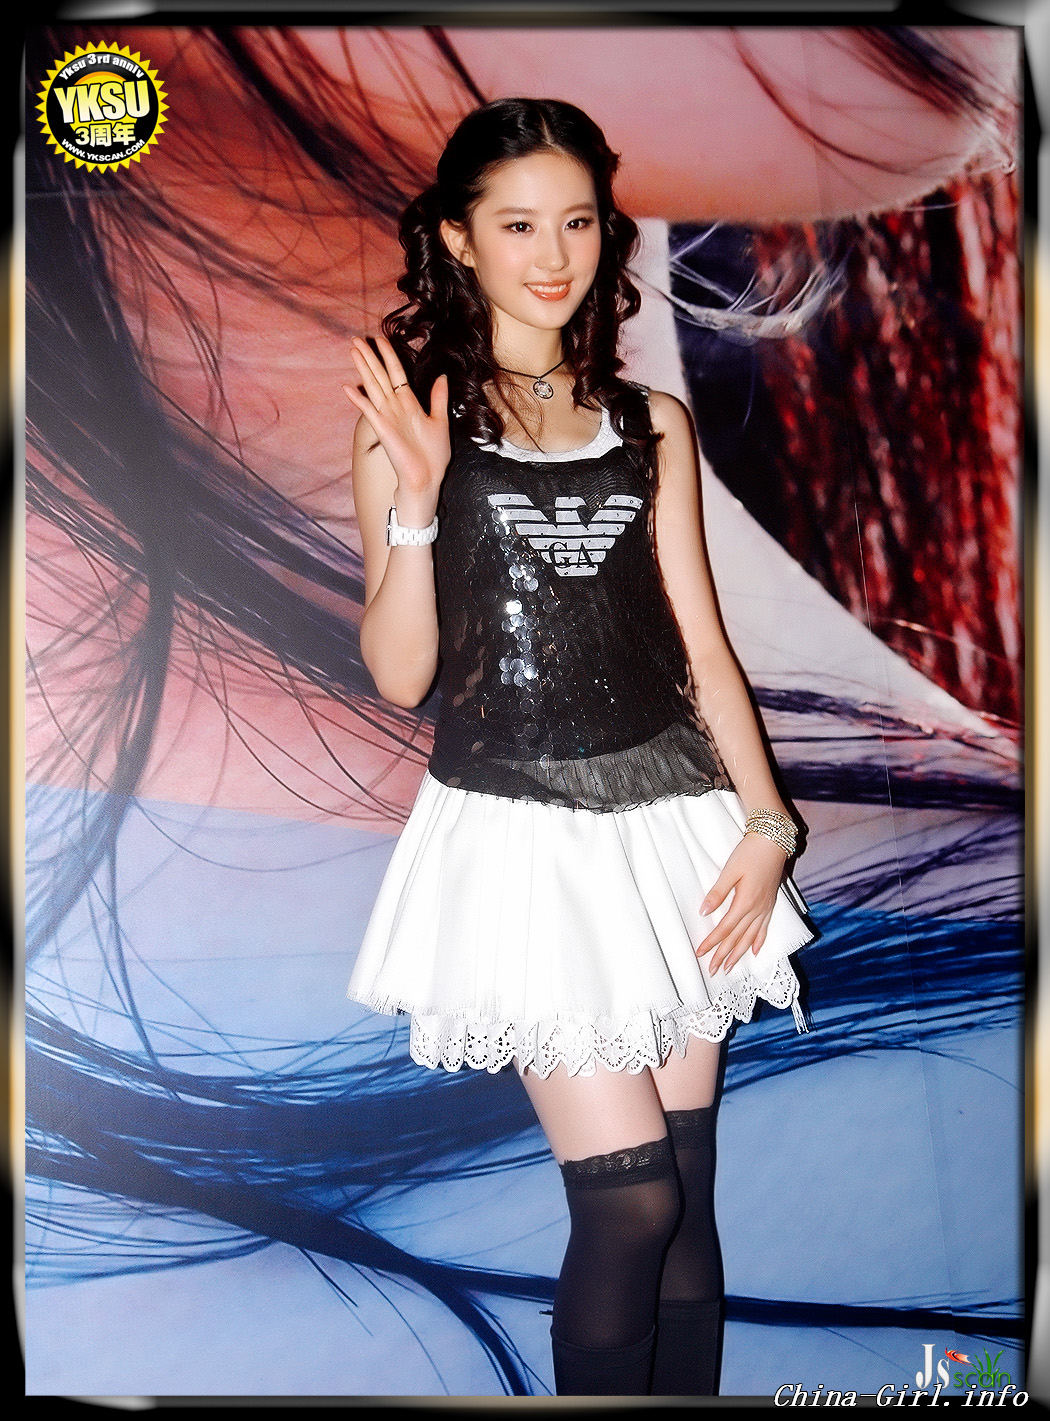 Liu yi fei nipples phrase... super